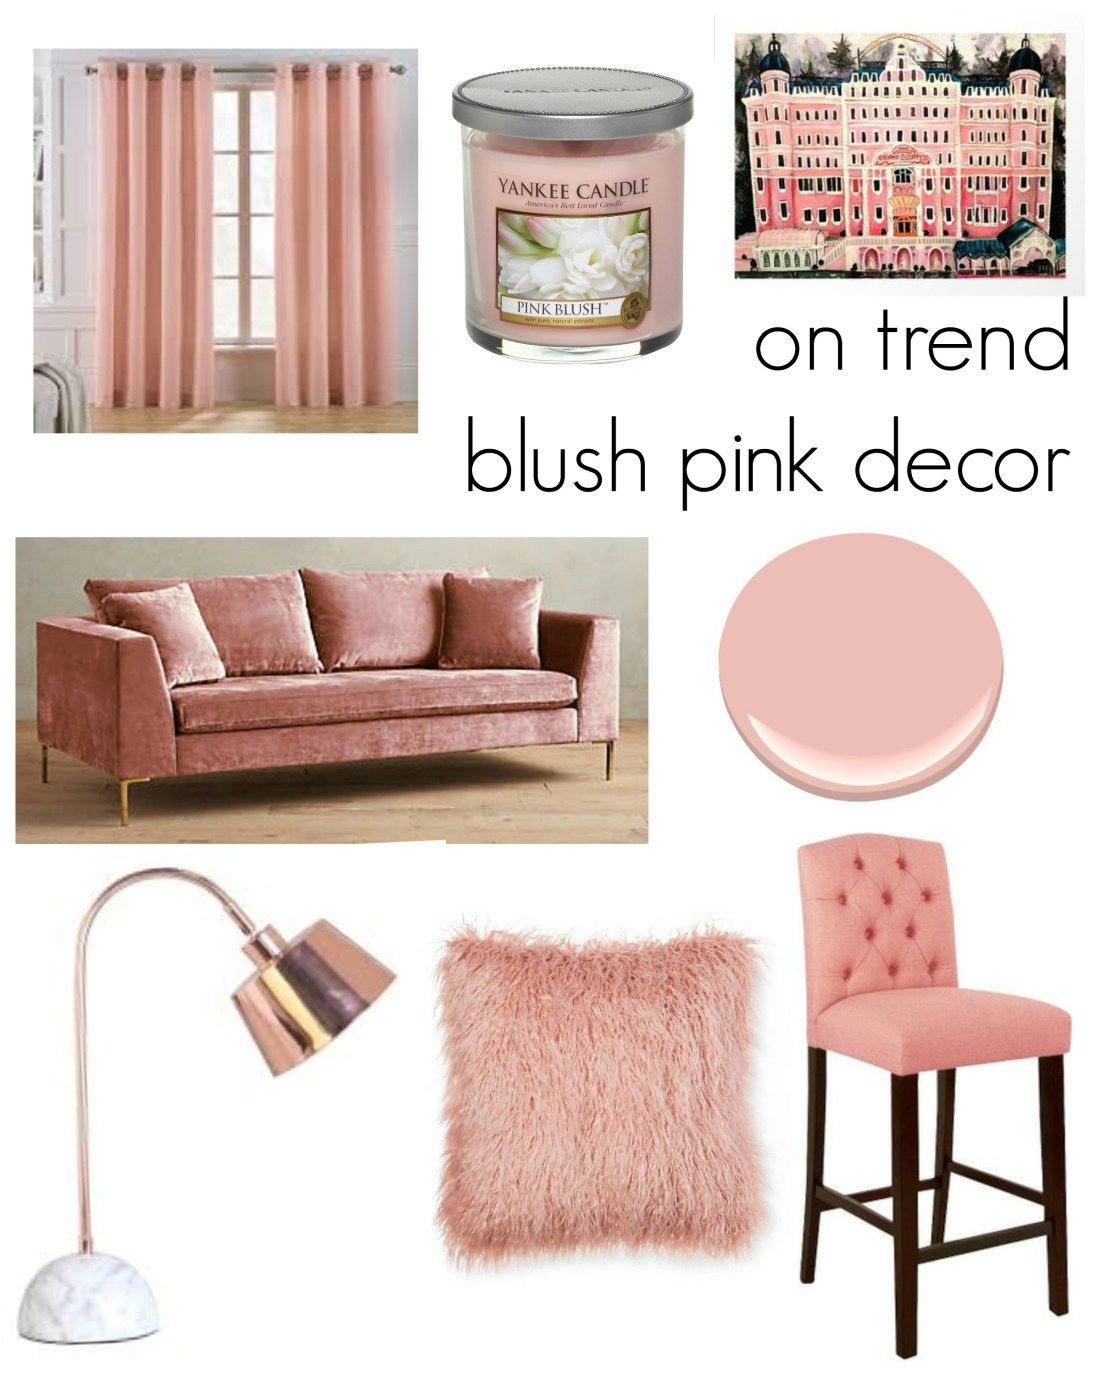 Blush Pink Decor Trend Via Remixed